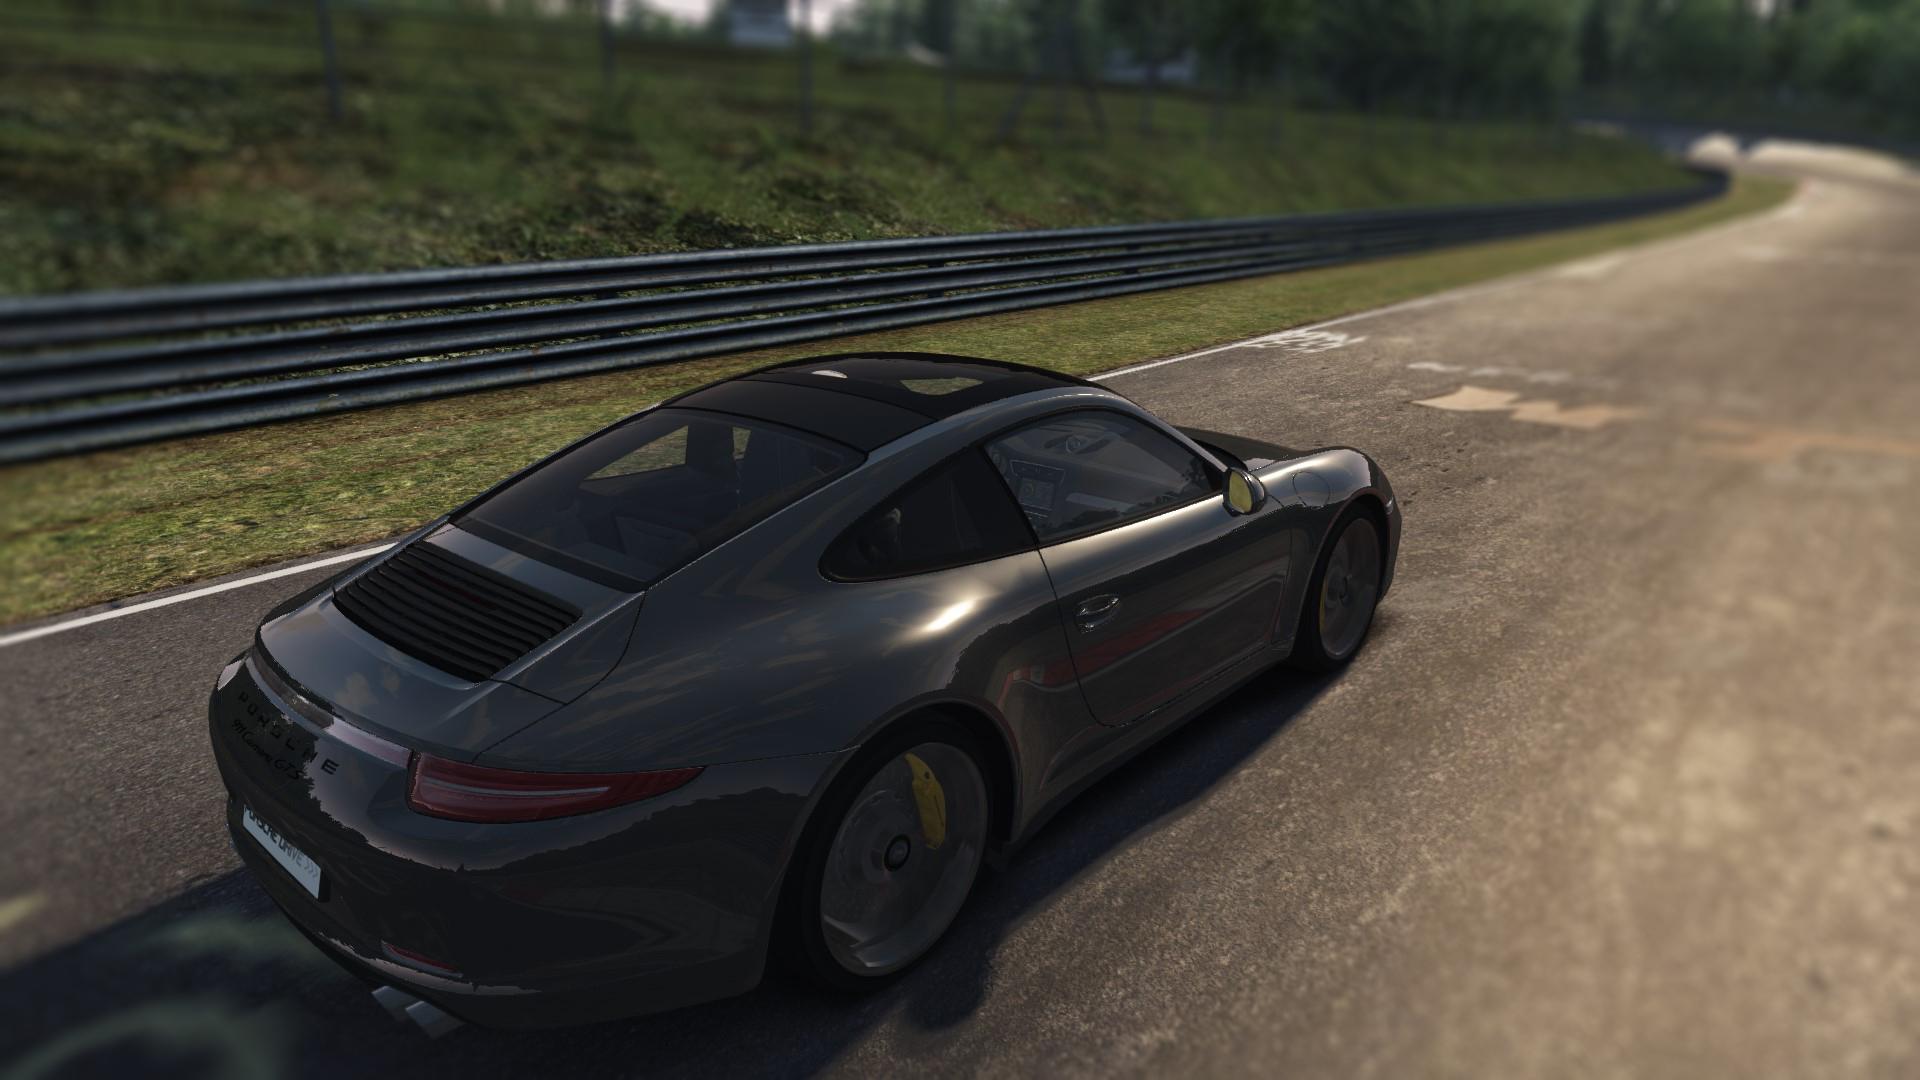 991 Carrera GTS (Clean body edition)